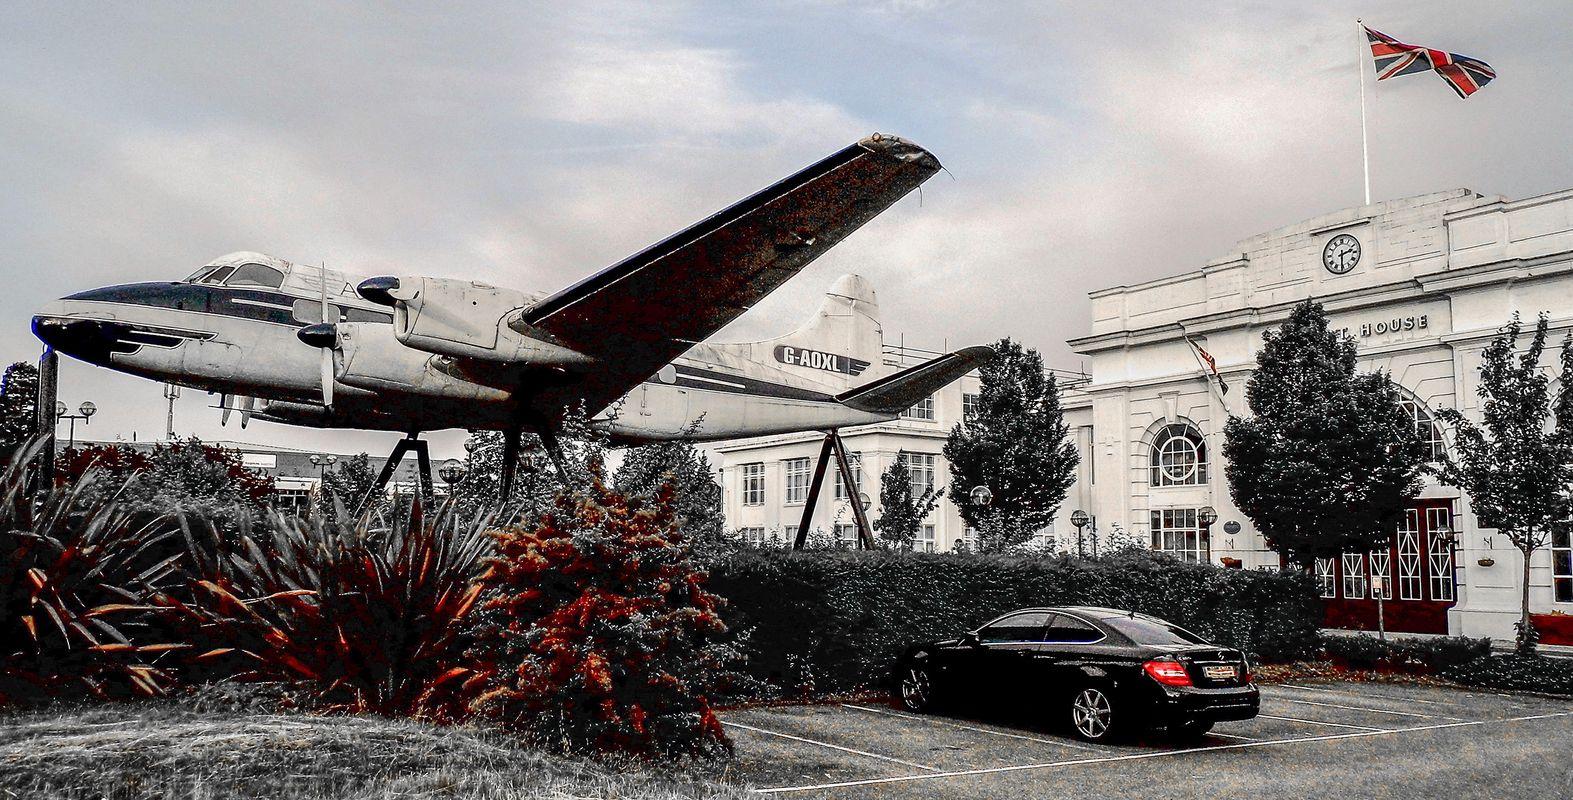 De Havilland Heron at Airport House.